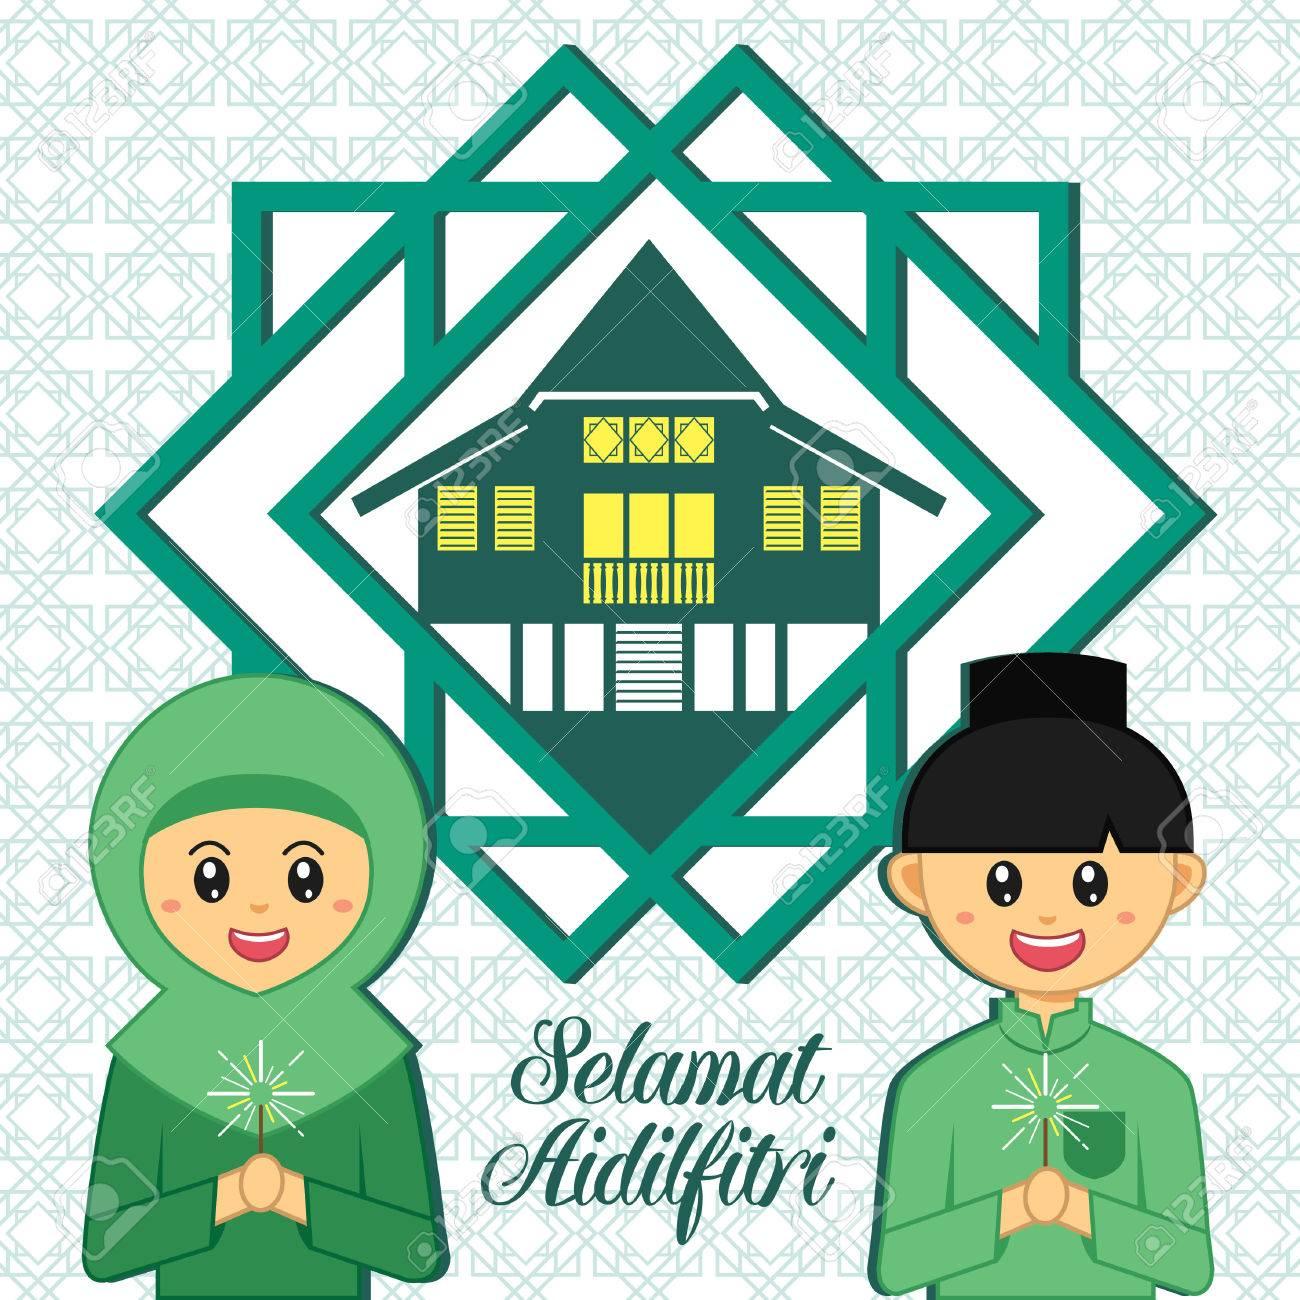 Hari Raya Aidilfitri vector illustration. Cute muslim boy and girl with traditional malay village house / kampung. Caption: Fasting Day of Celebration - 77669944